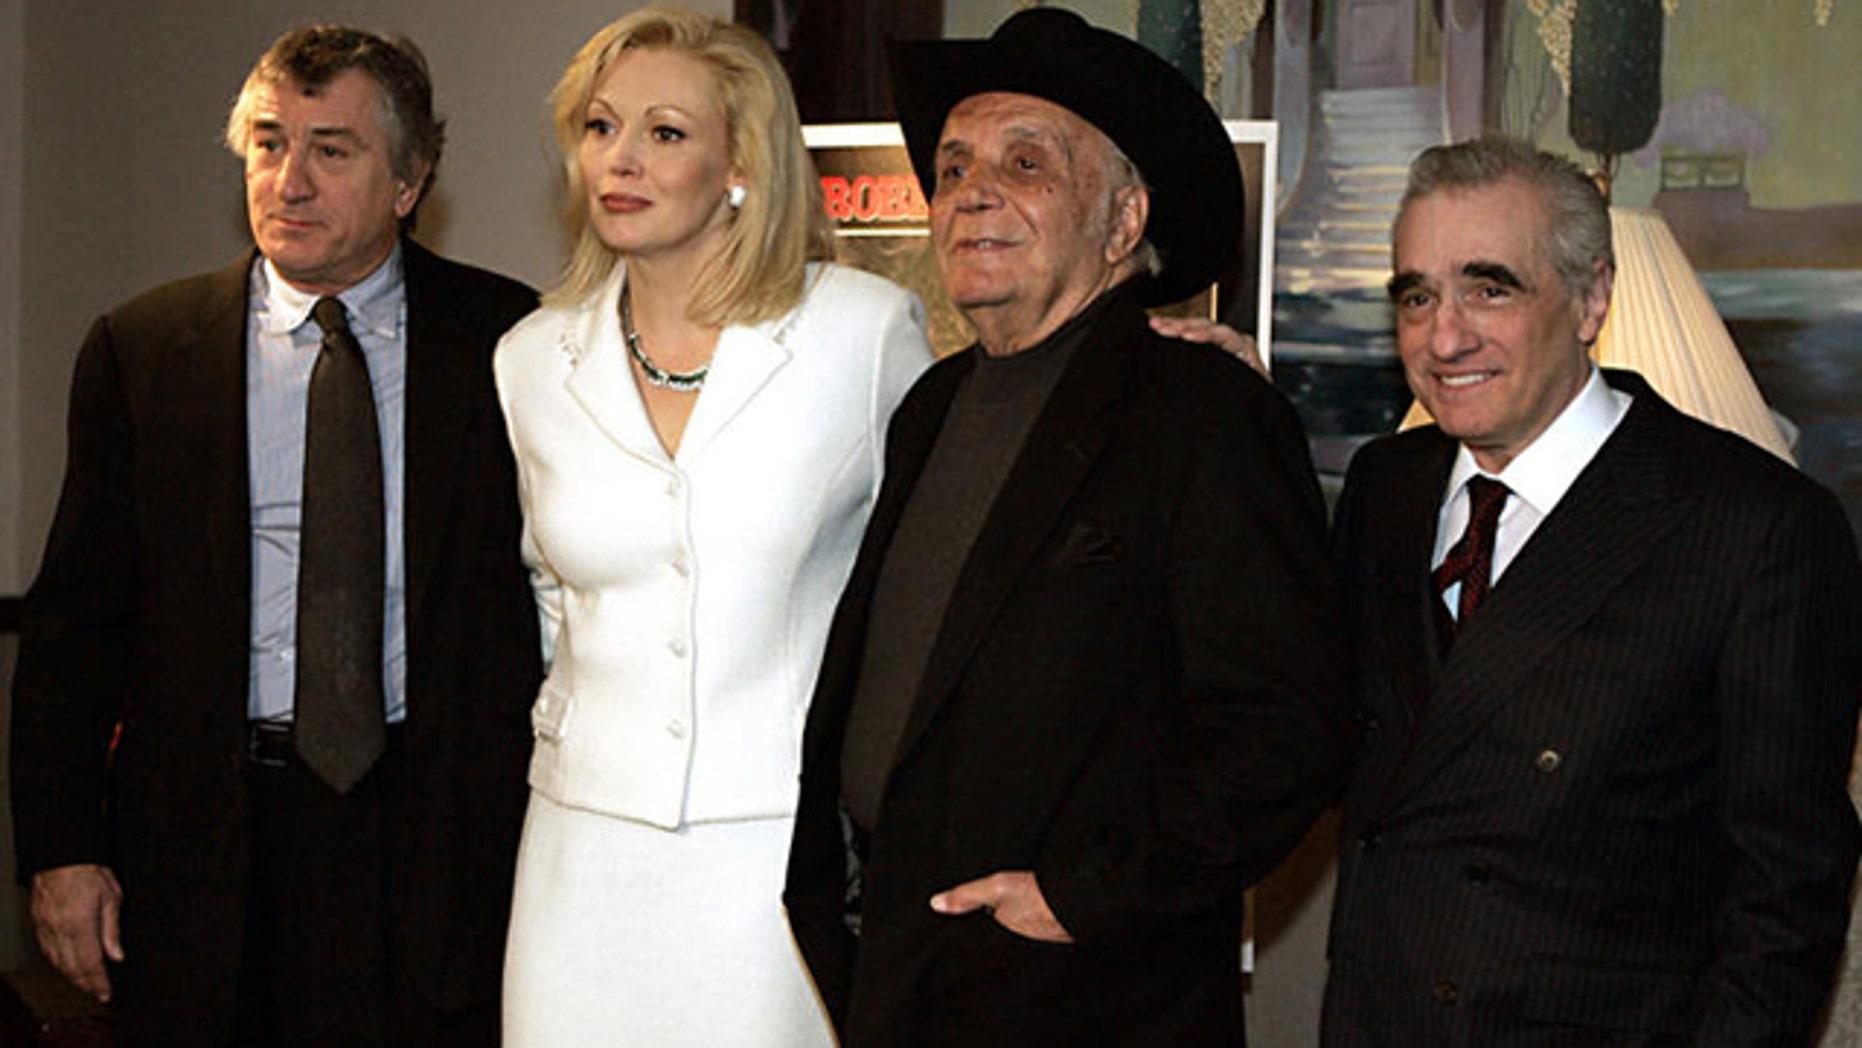 Robert De Niro, actor; Cathy Moriarty, actress; Jake LaMotta, former boxer; and Martin Scorsese, director in 2005. (AP)